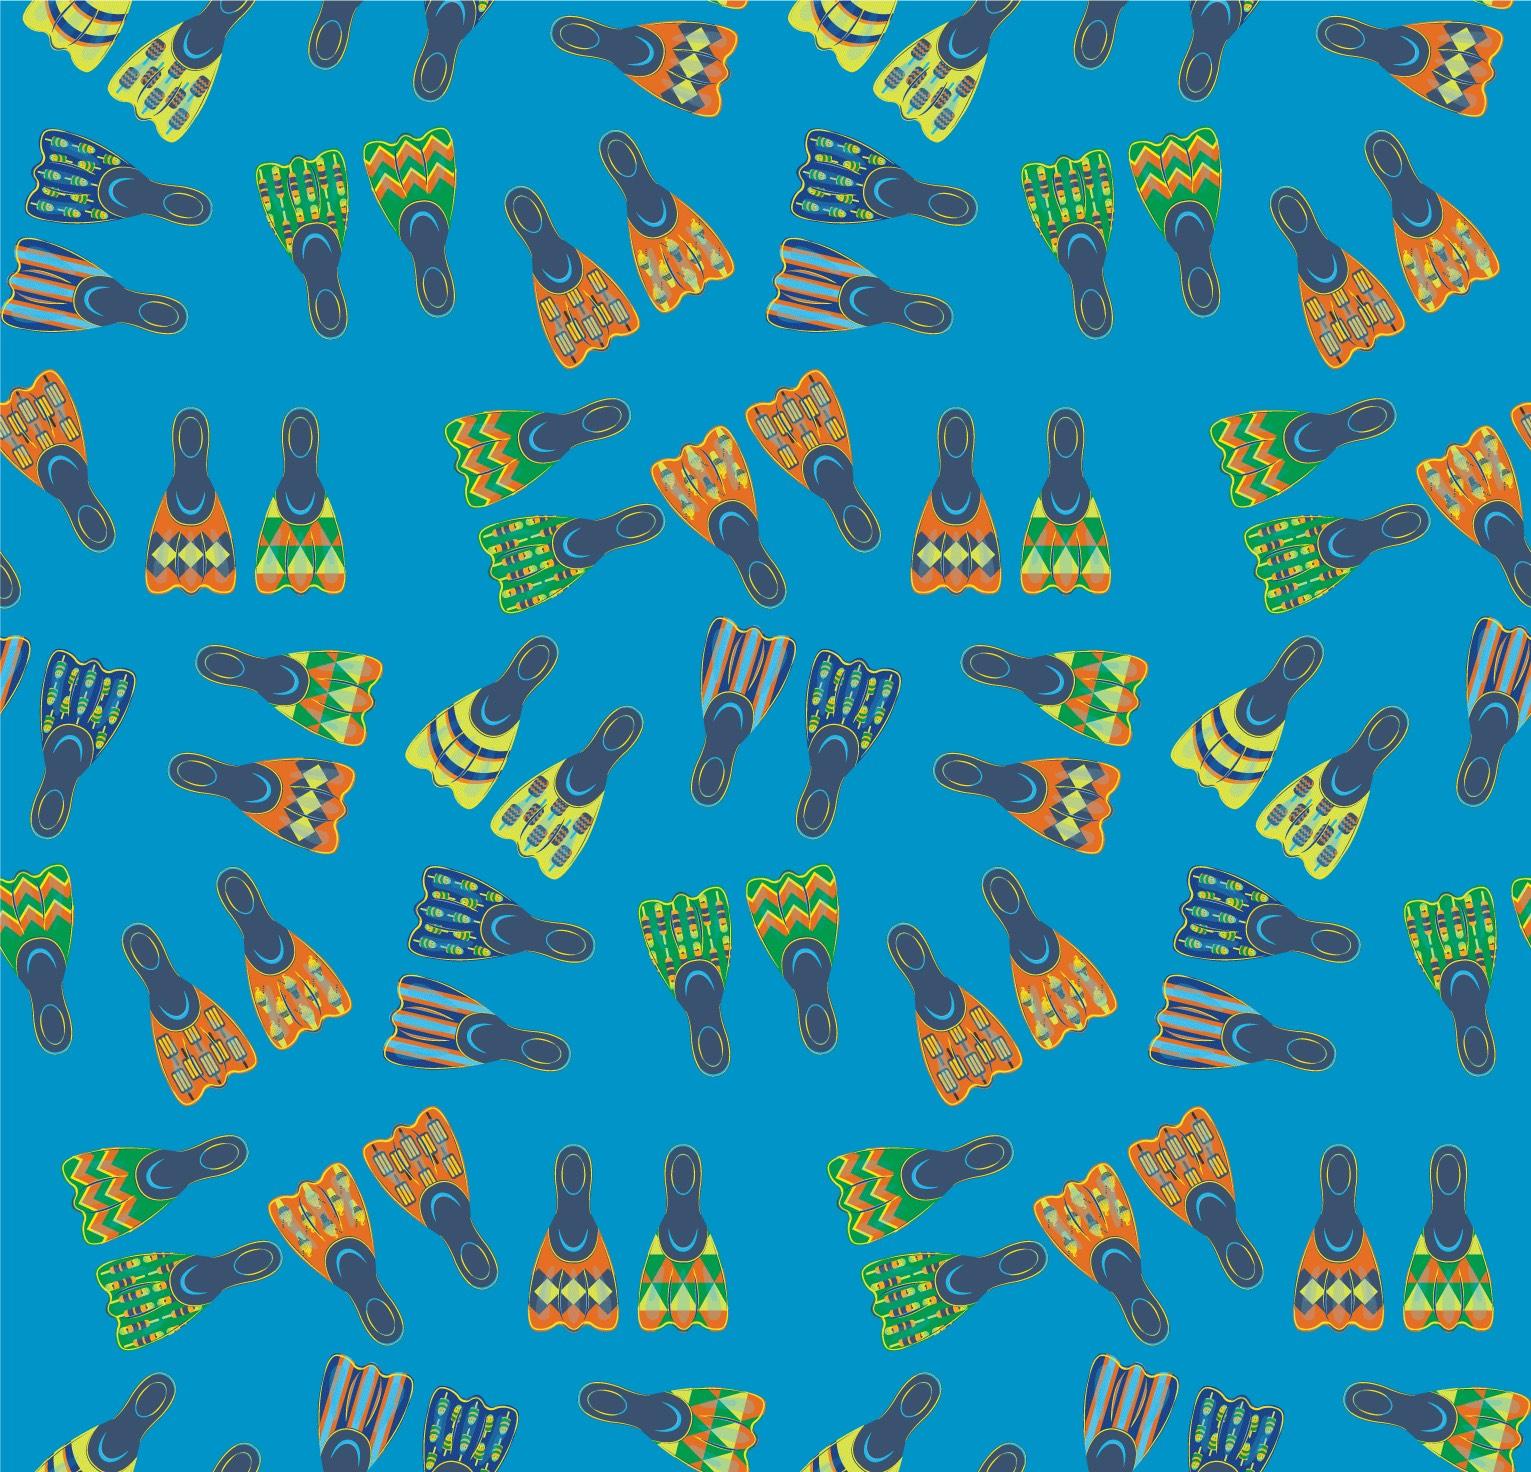 ProductDesign_Pattern_Summer_Flippers